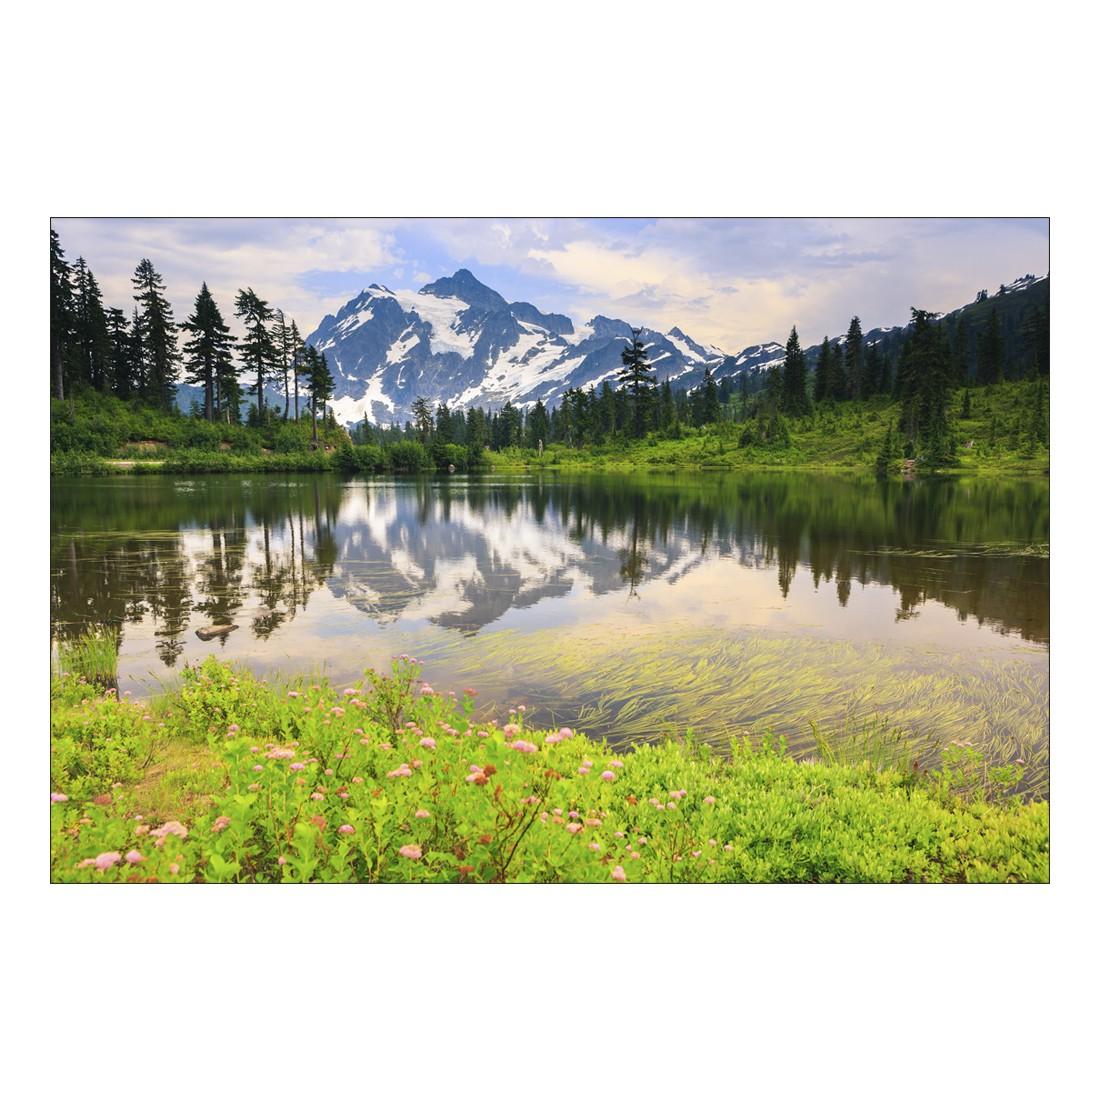 Acrylglasbild Lake and Mountain, 90×60 cm – Abmessung 60×40 cm, Gallery of Innovative Art jetzt kaufen